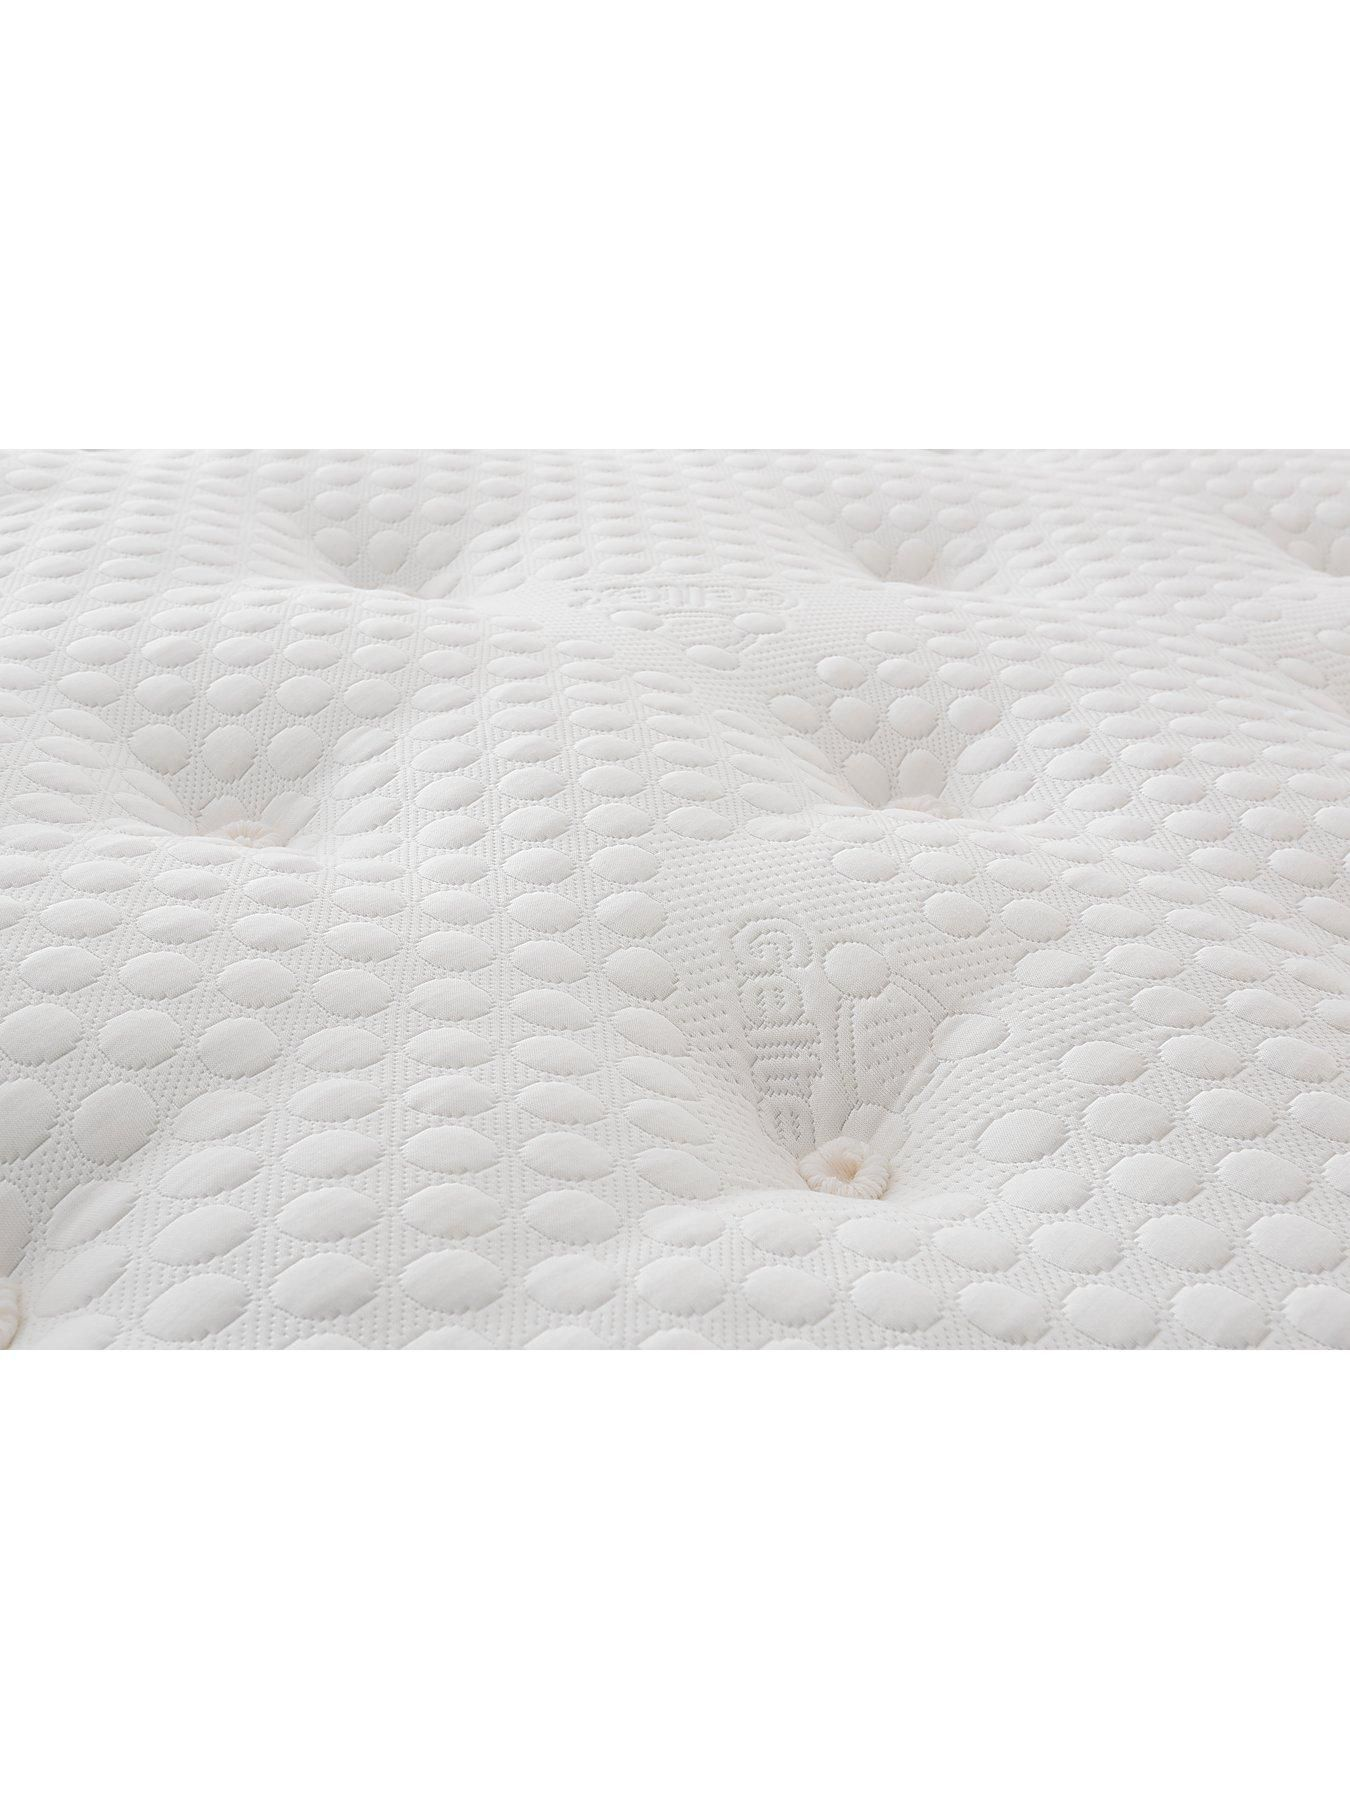 Silentnight Mirapocket Mia 1000 Geltex Pillow Top King